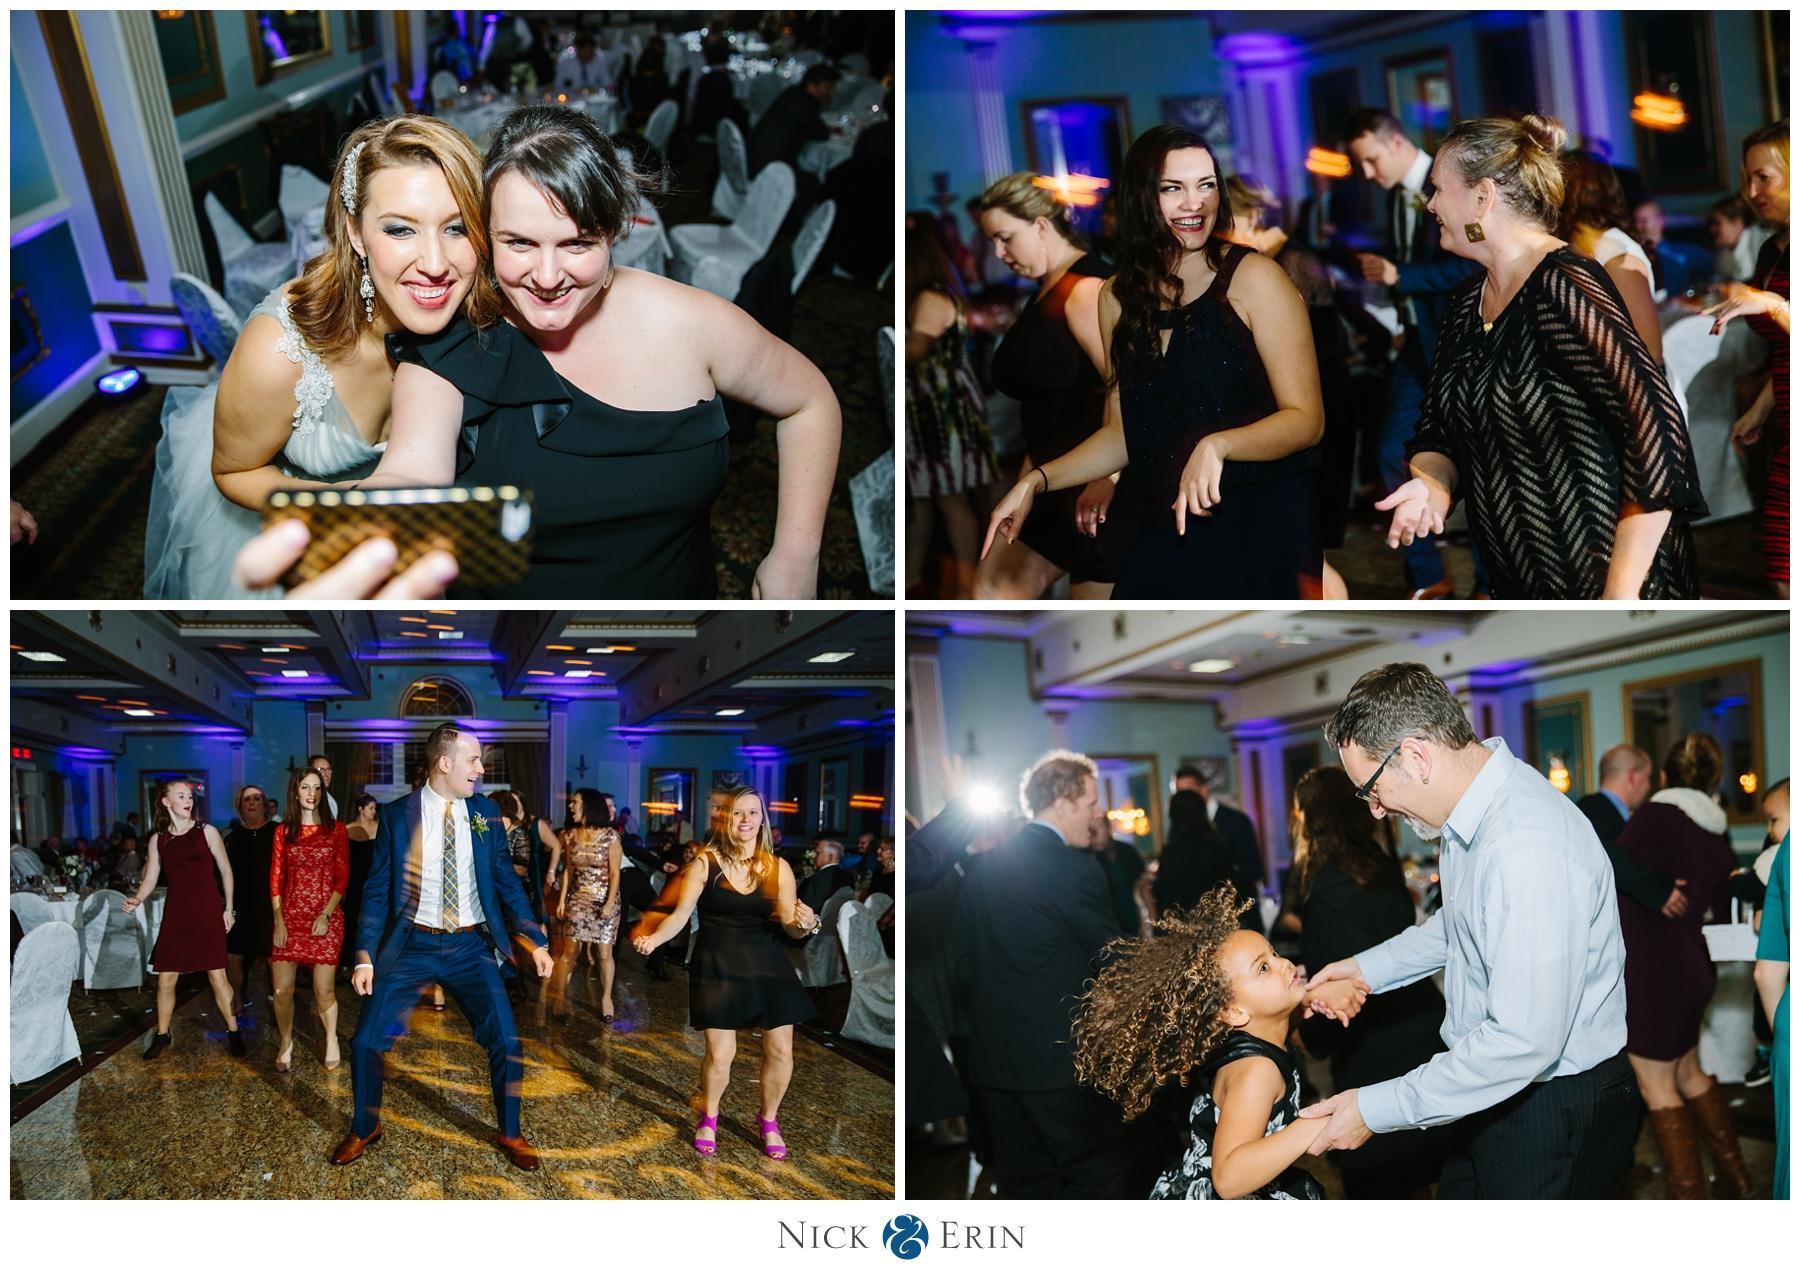 Donner_Photography_Mendenhall Inn Wedding_Blake & Kristina_0045